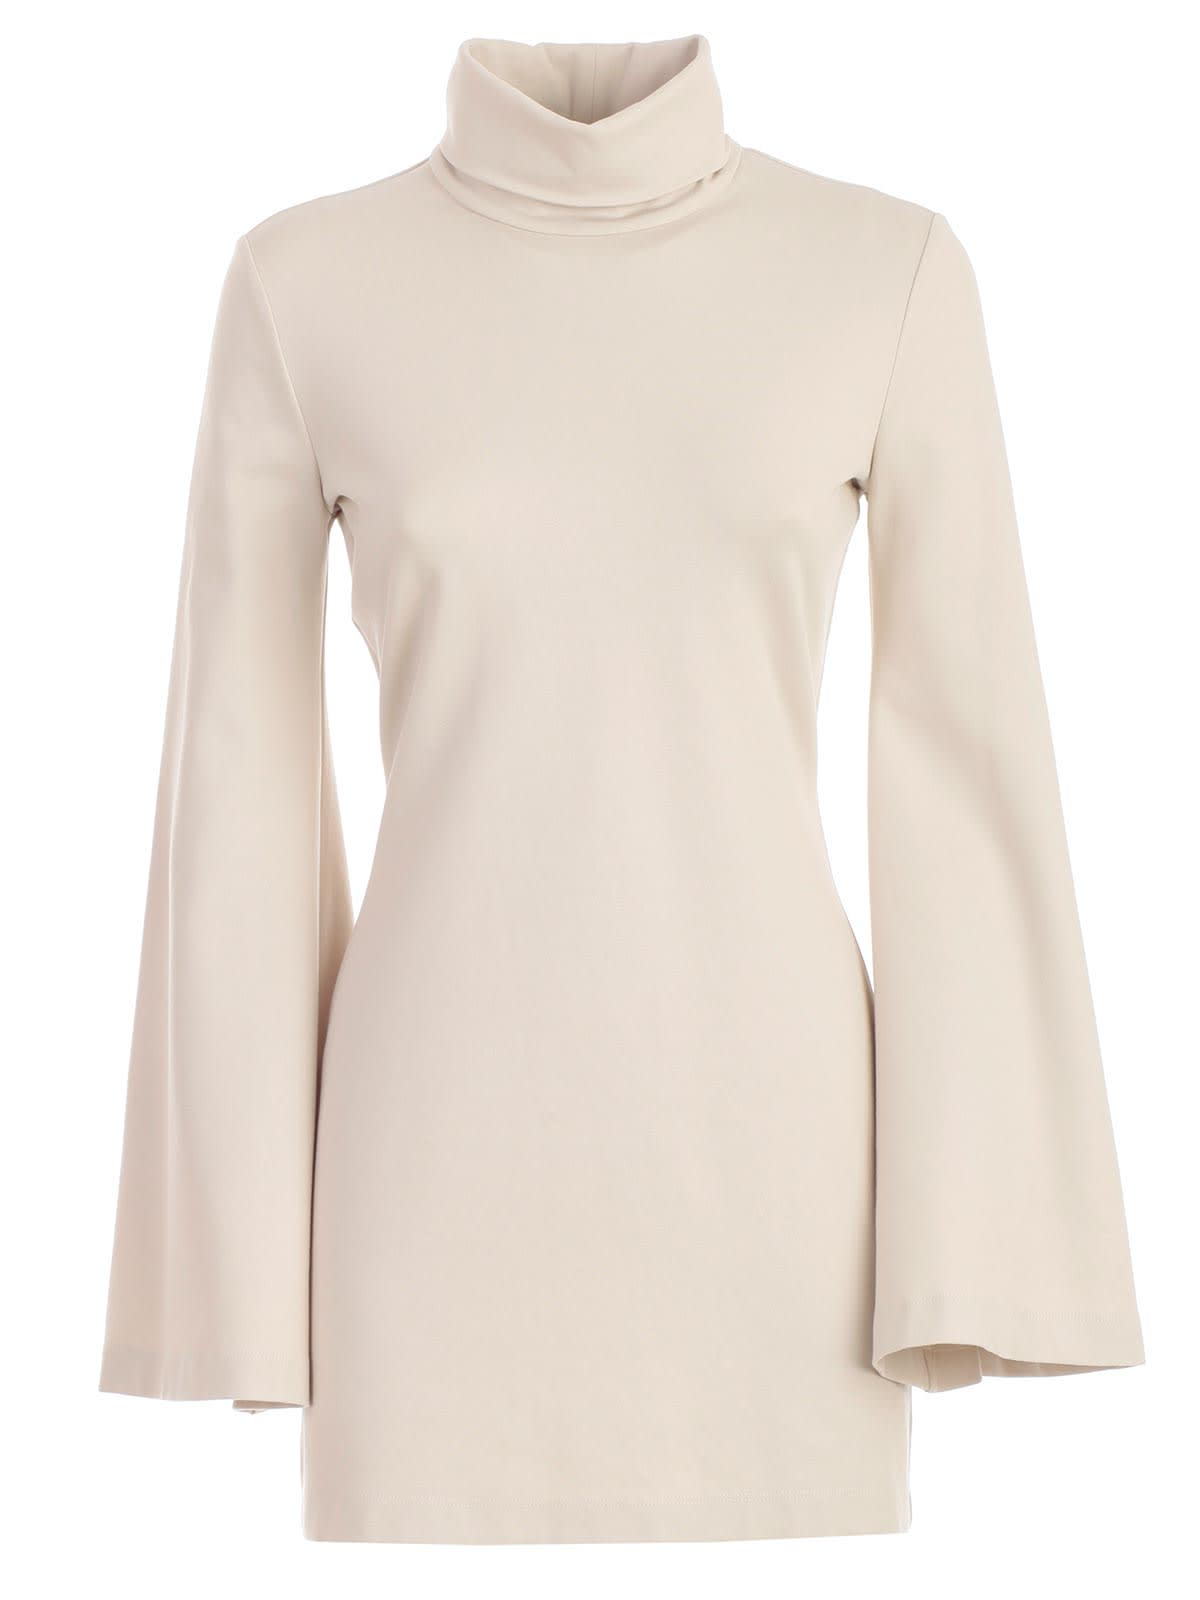 Sara Battaglia Dress L & s High Neck Pencil Jersey